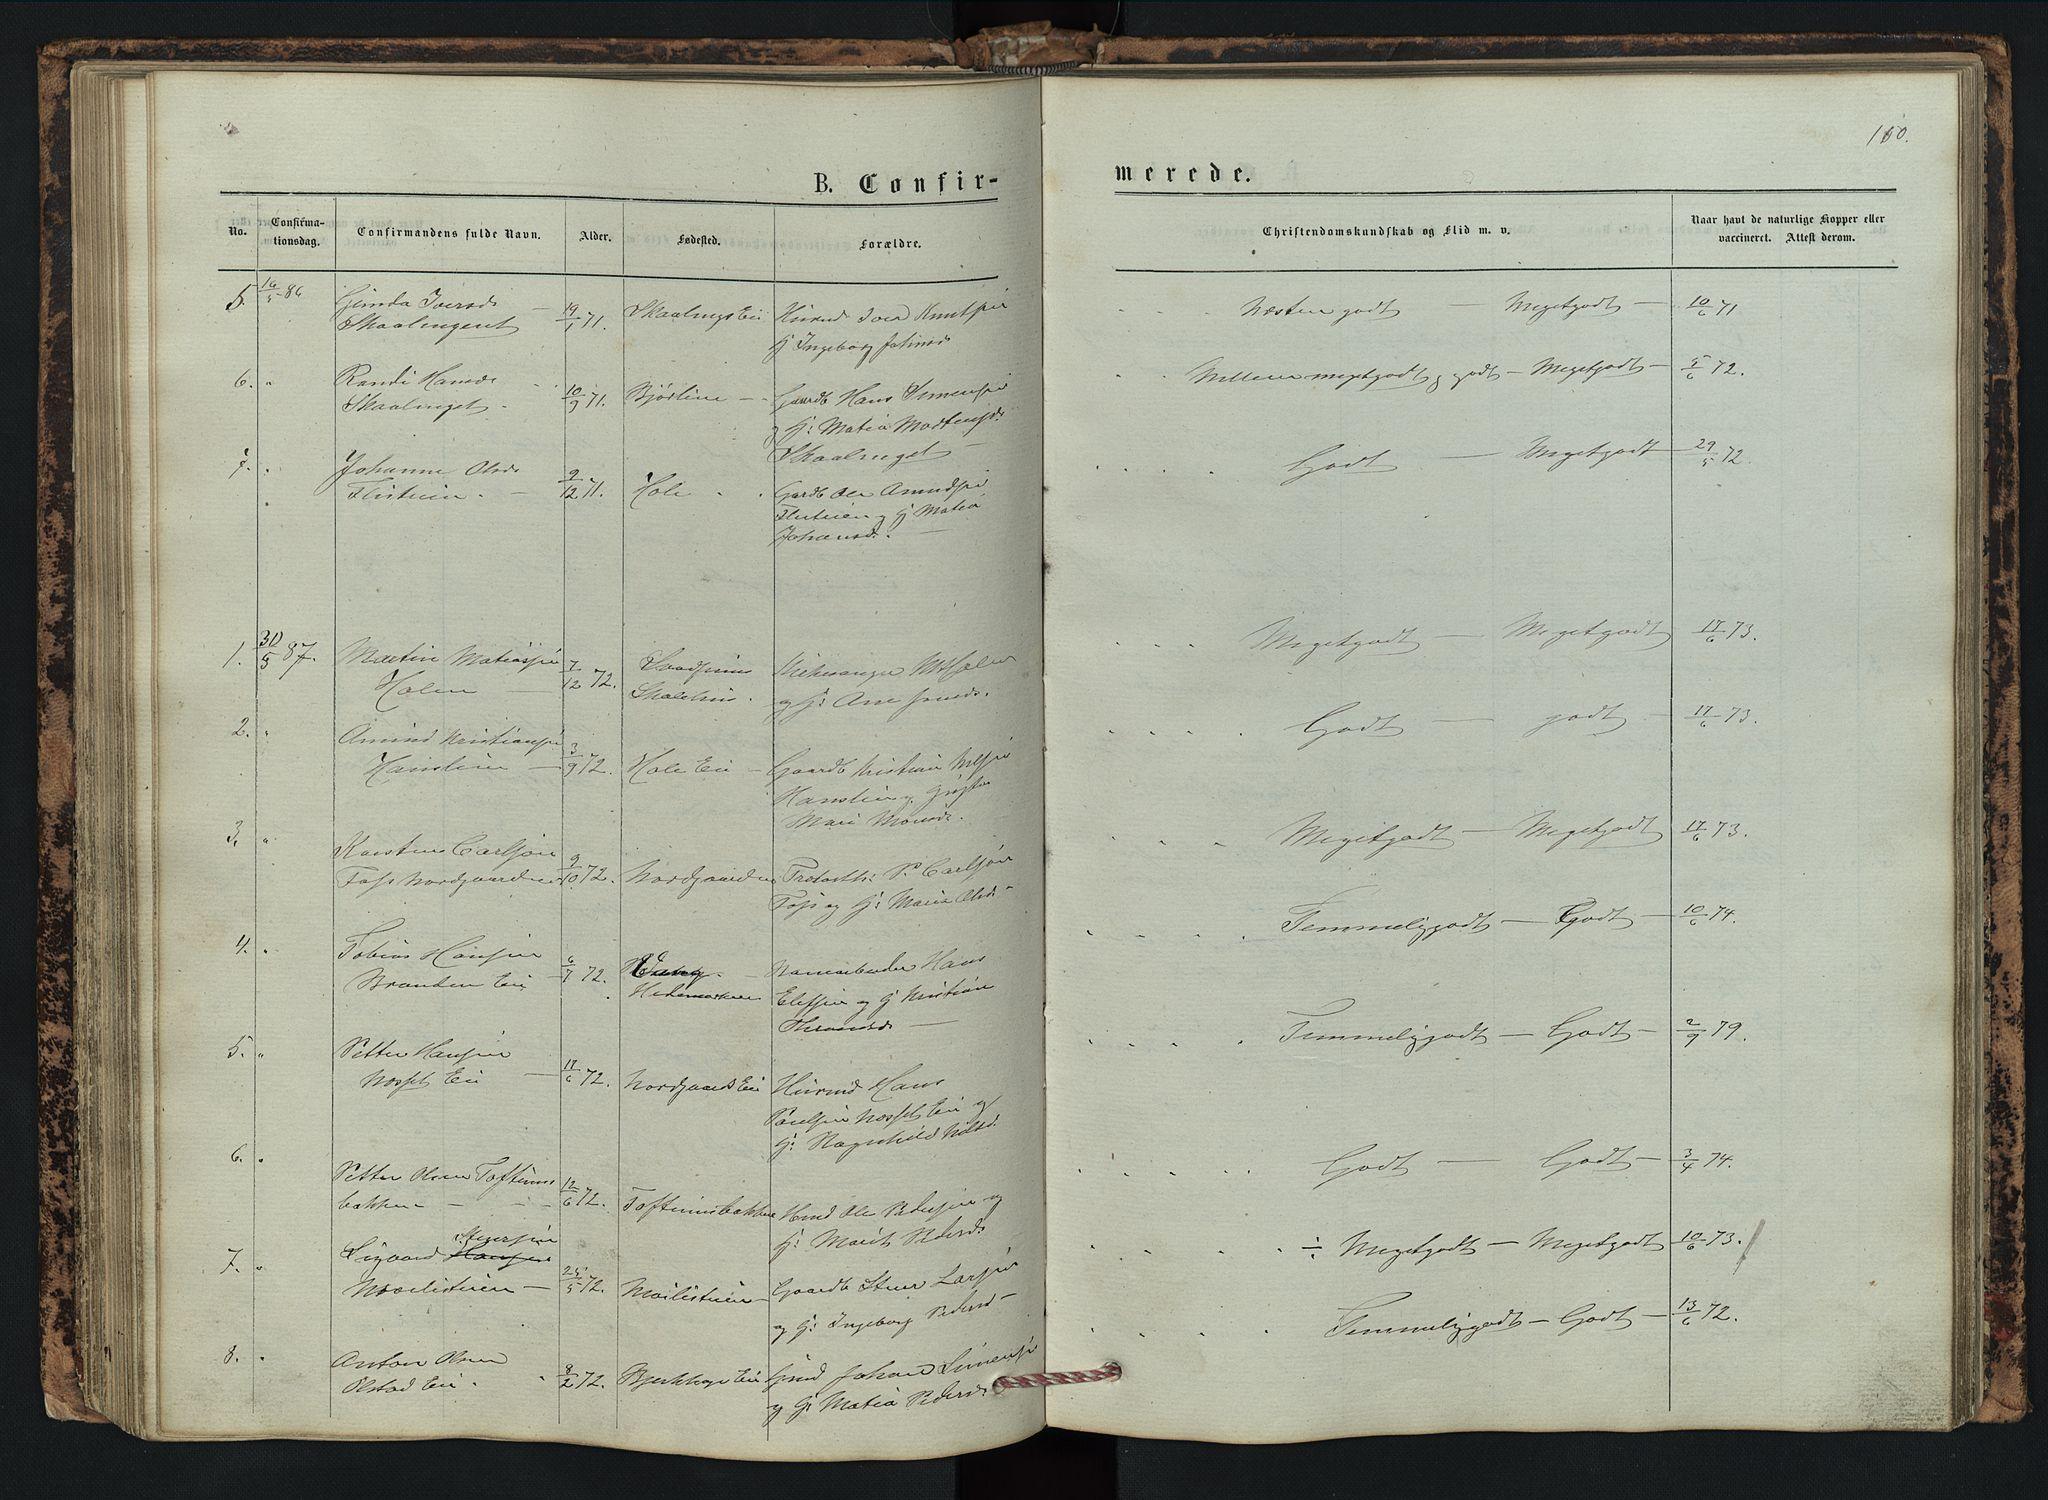 SAH, Vestre Gausdal prestekontor, Klokkerbok nr. 2, 1874-1897, s. 110